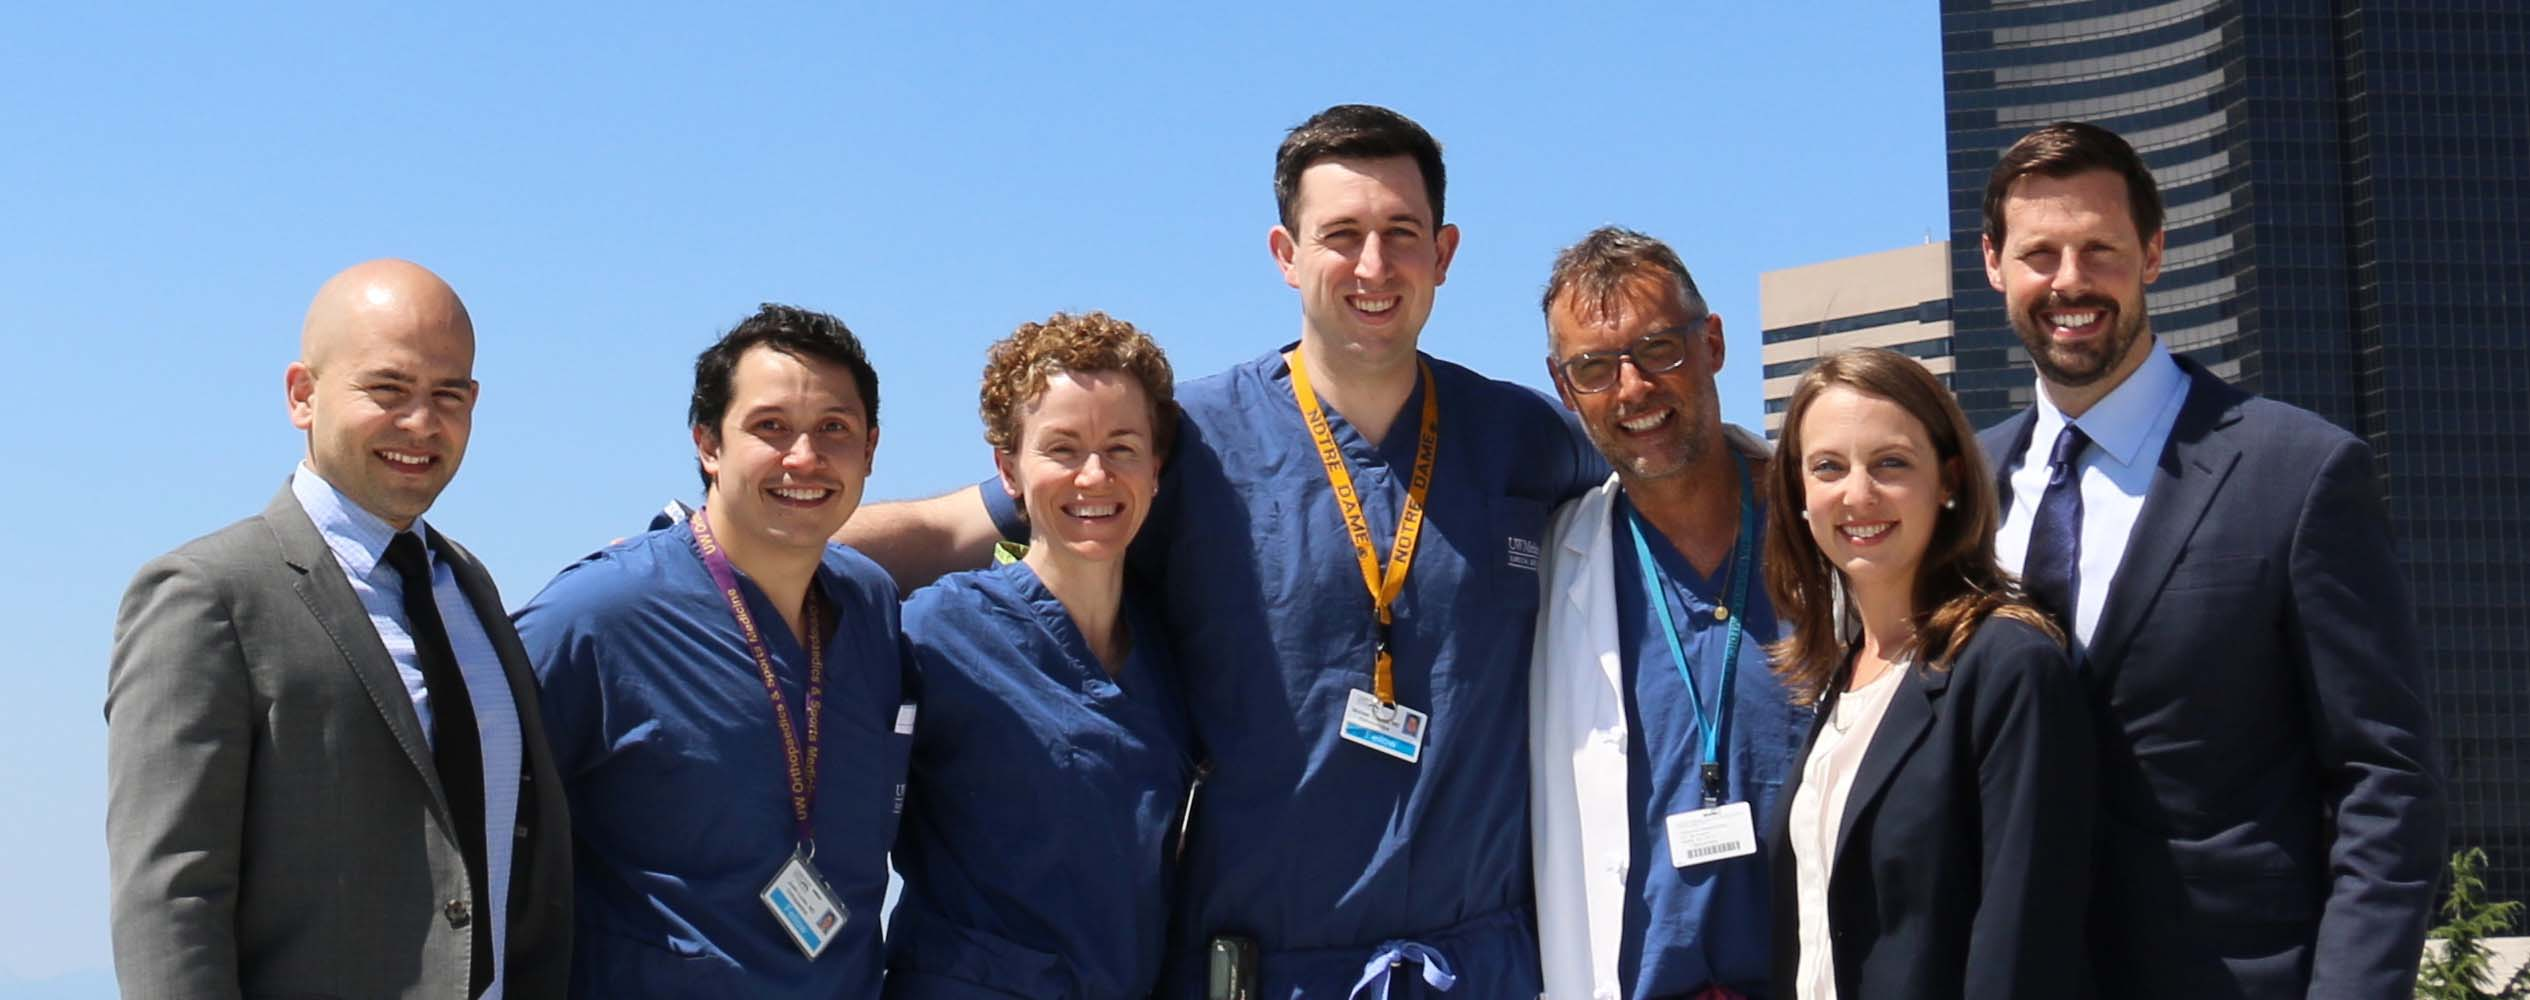 Traumatology Fellowship | UW Orthopaedics and Sports Medicine, Seattle